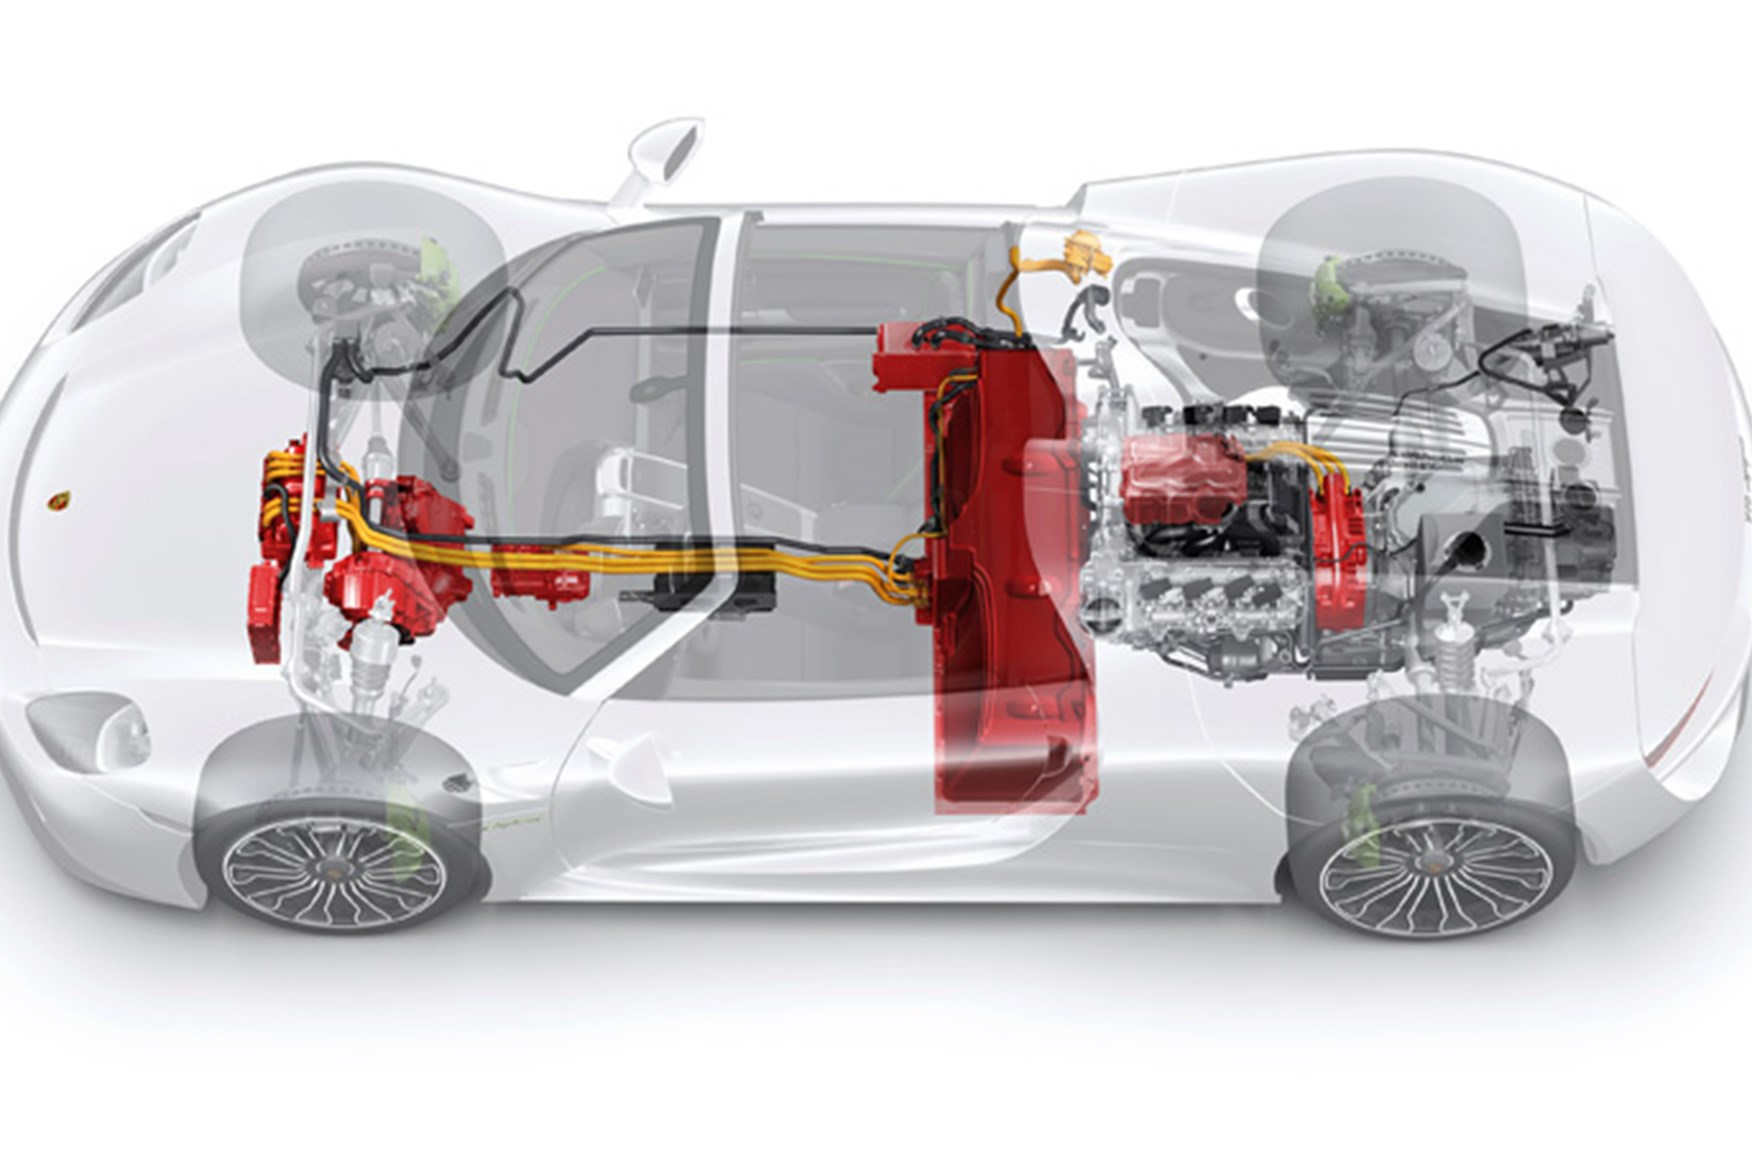 2003 Honda Civic Hybrid Engine Diagram Electrical Wiring Diagrams Fit Of Mclaren S Smart U2022 2009